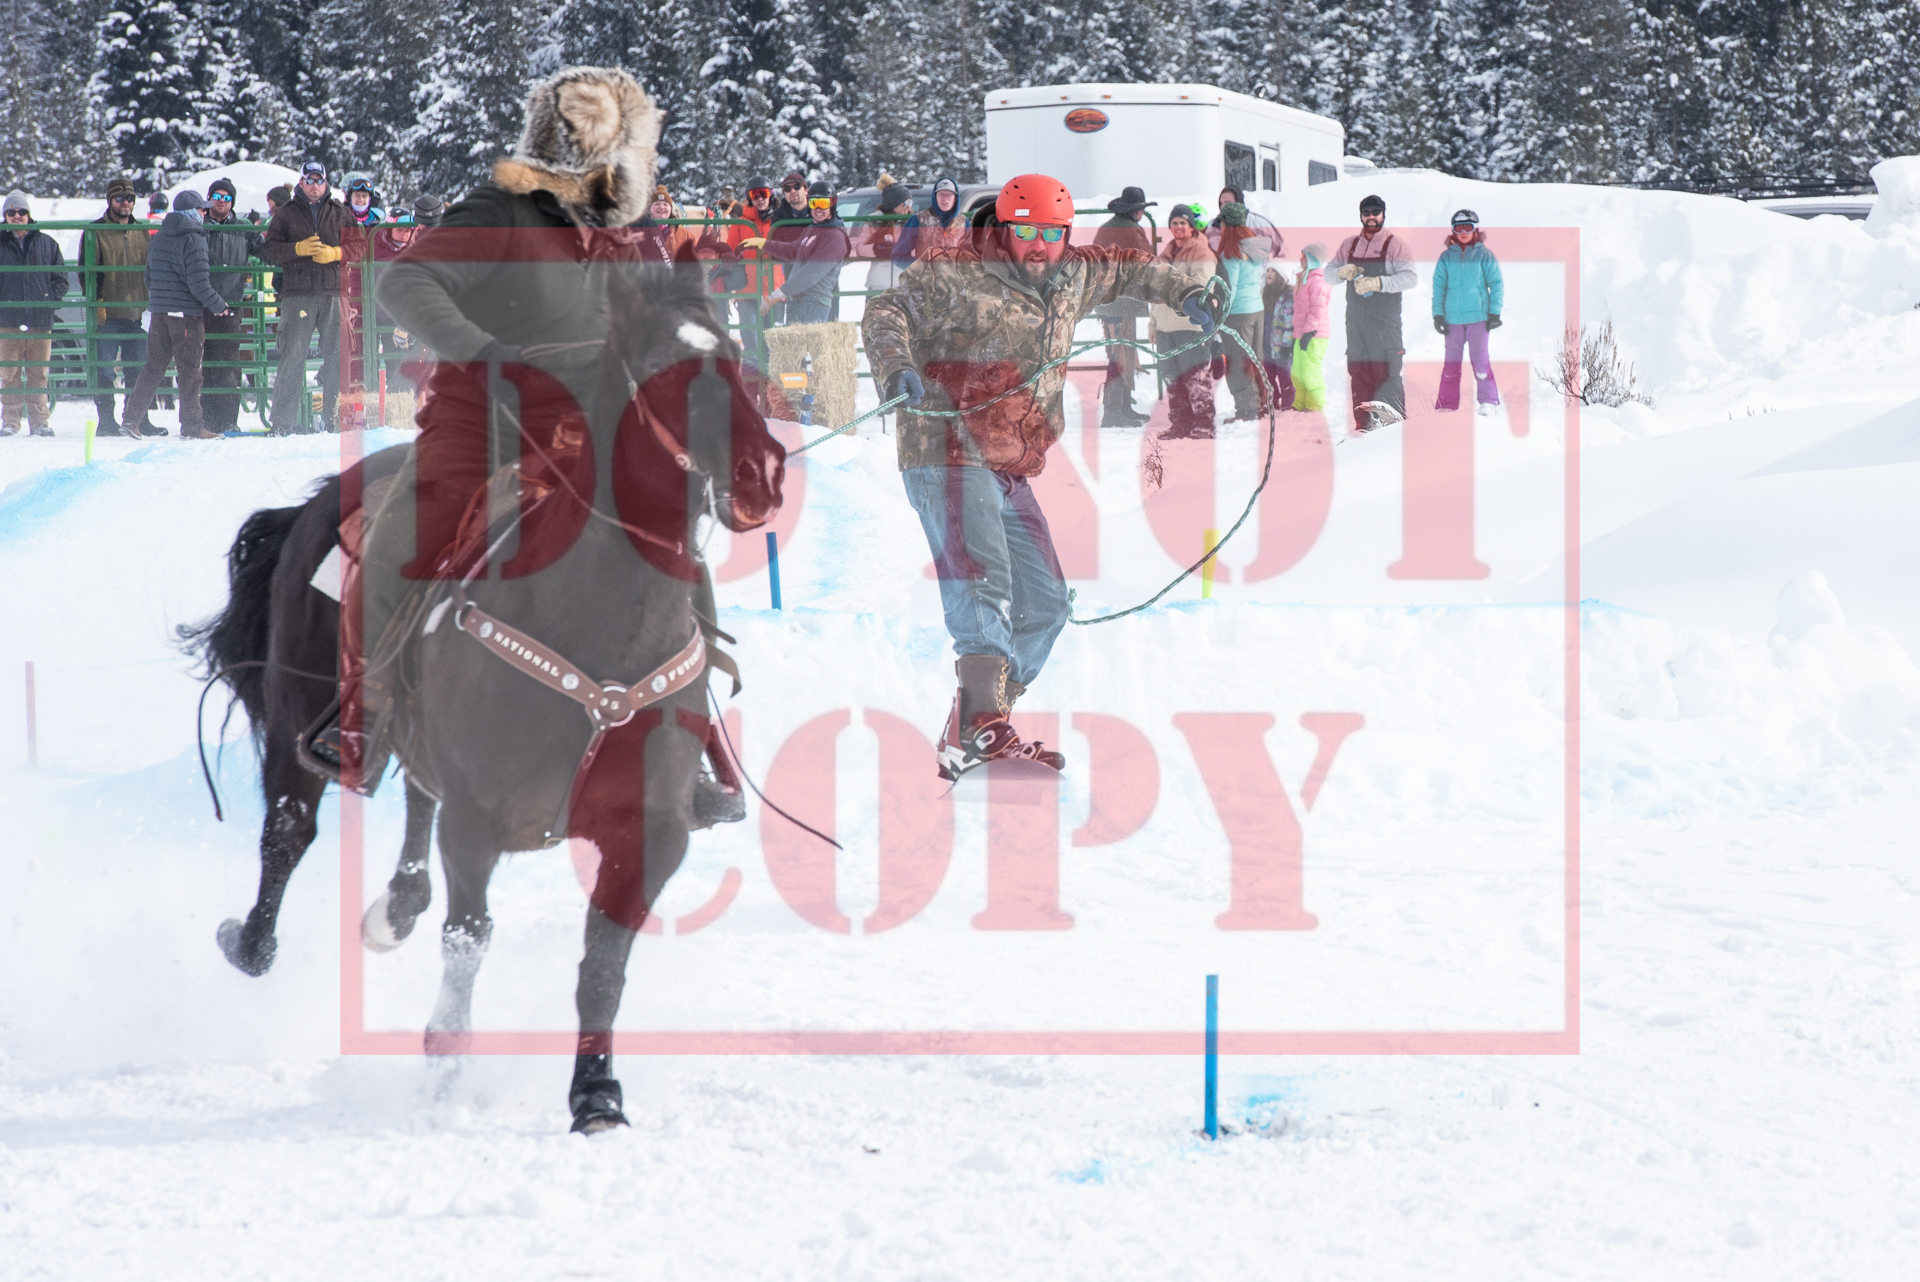 - Rick Farnsworth - Snowboard 2